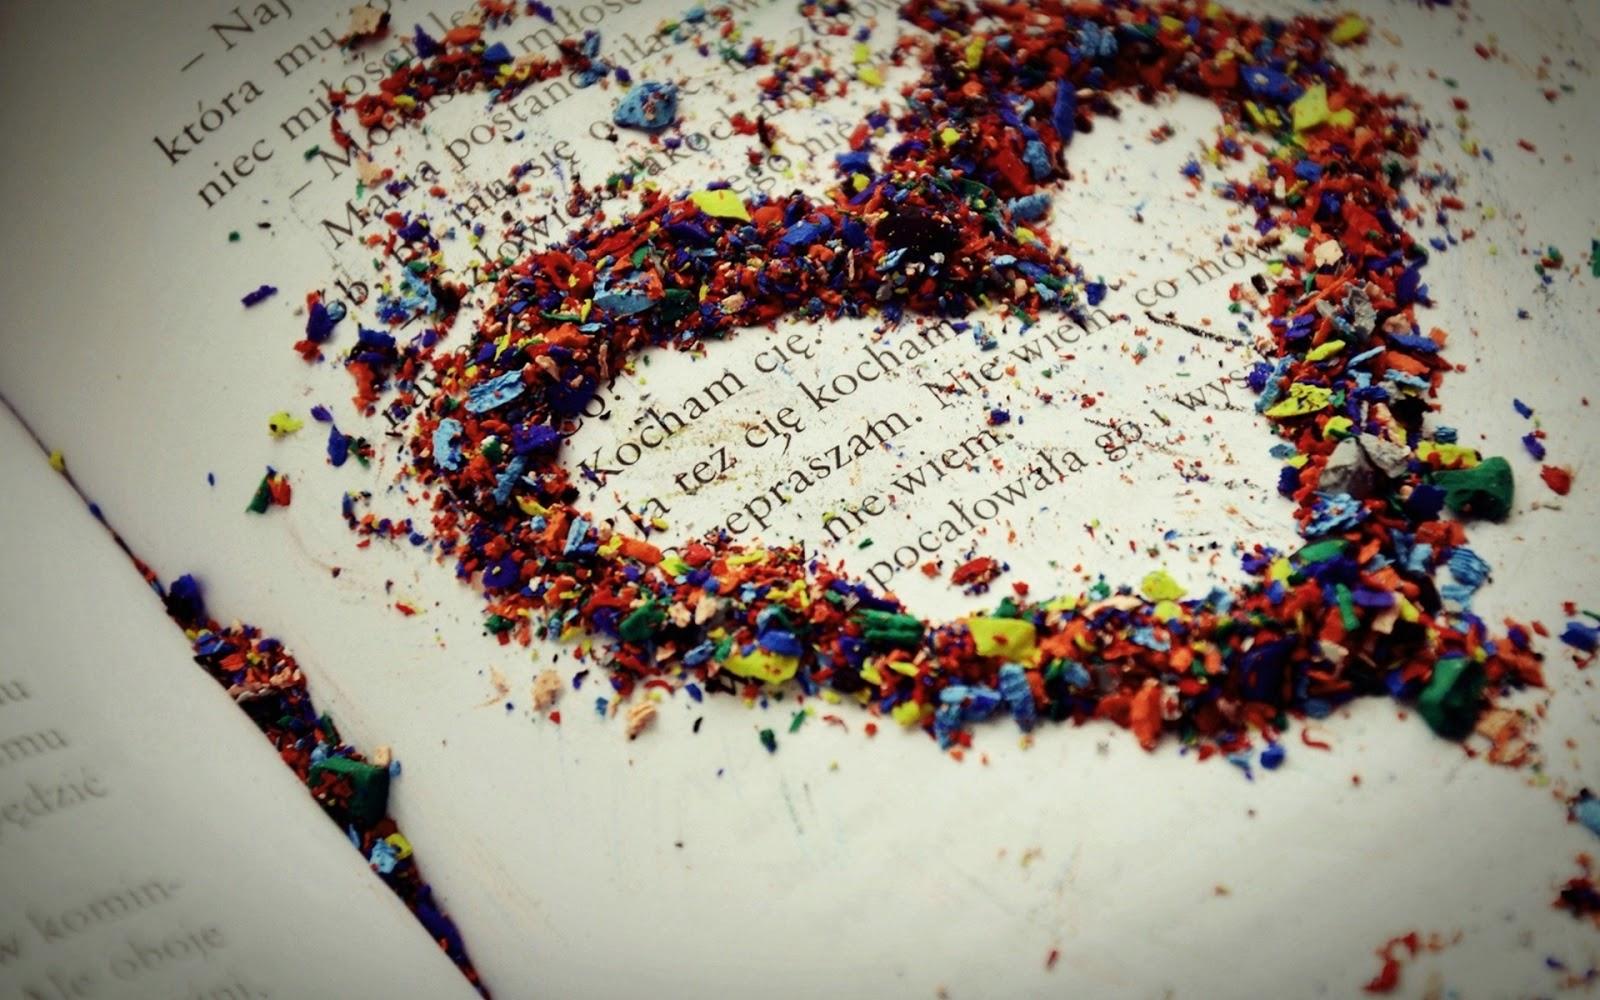 Book Writting HD Wallpaper Love Wallpapers Romantic Wallpapers 1600x1000